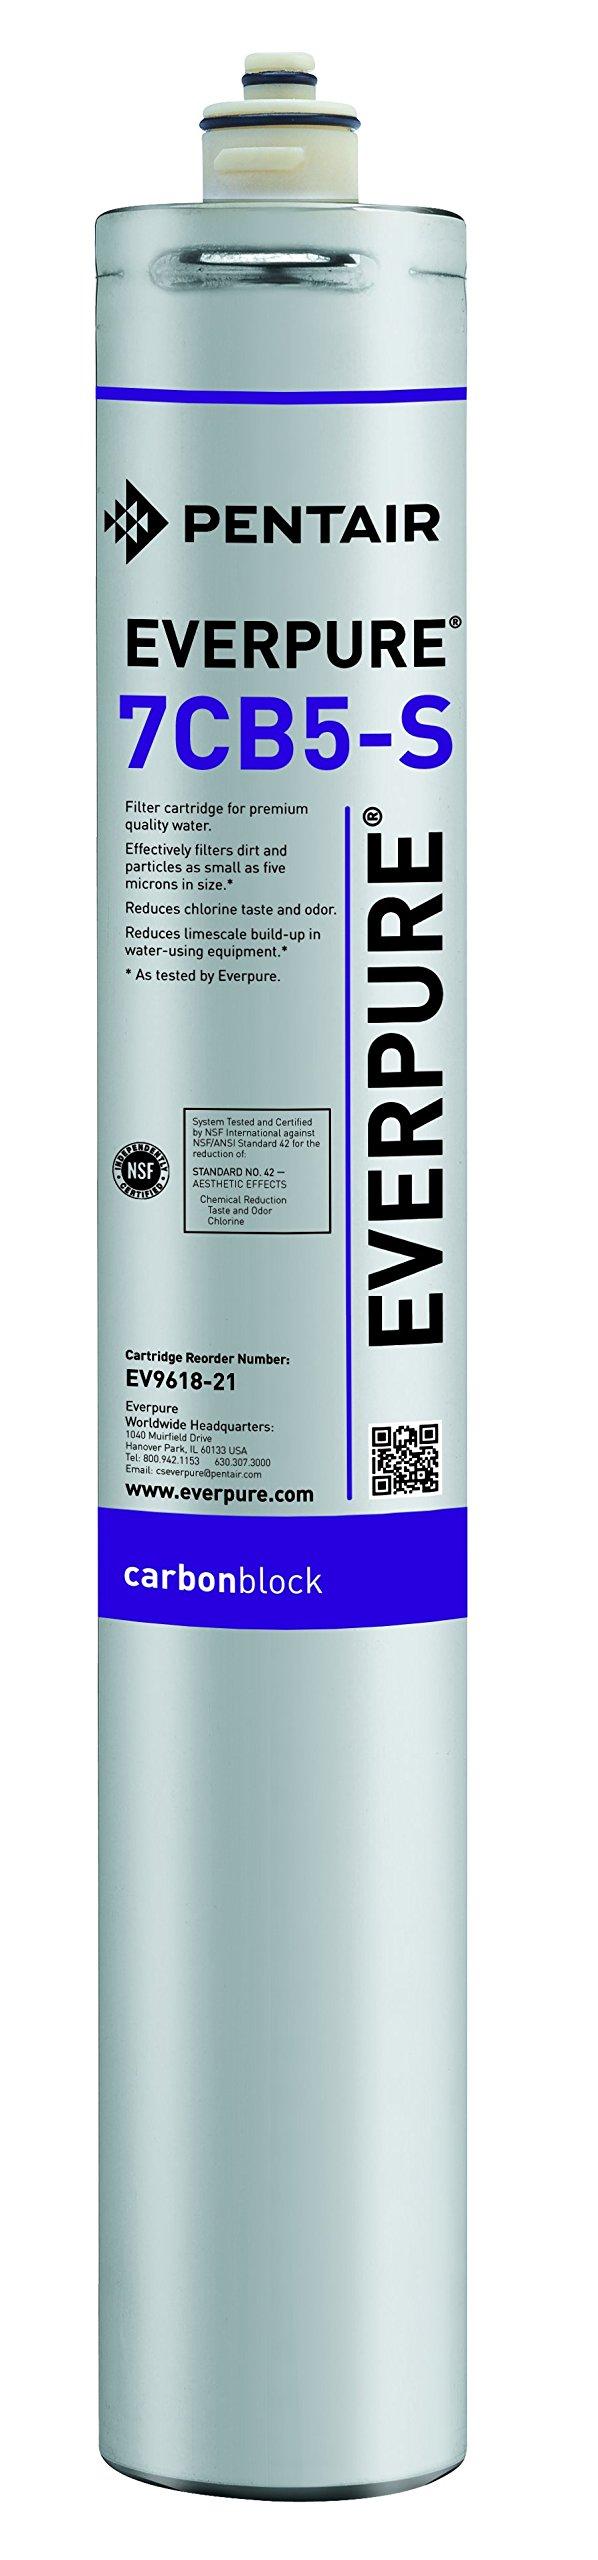 Everpure EV9618-21 7CB5-S Filter Cartridge